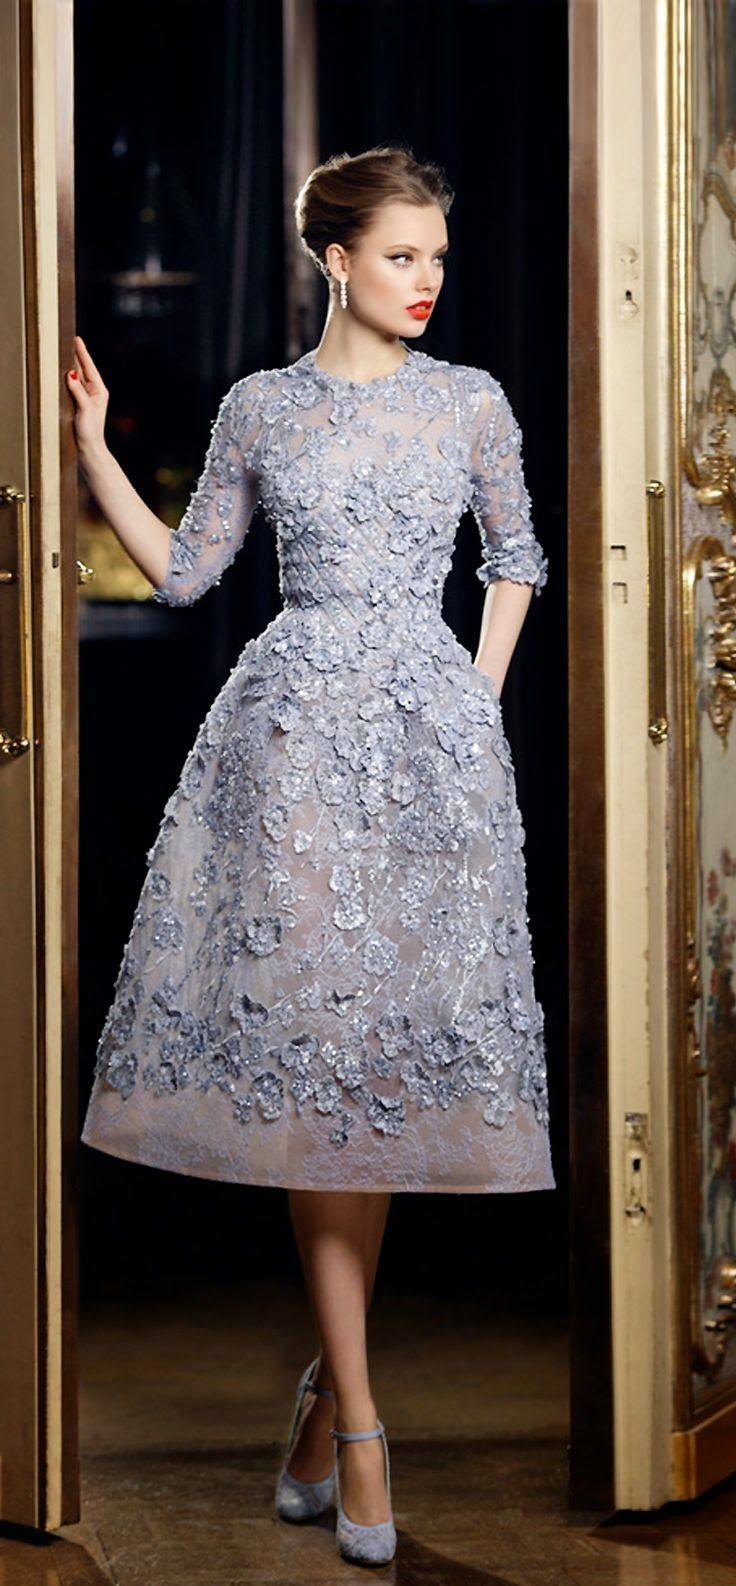 Batik dress for wedding party  Minimal Street Glamour Haute Couture Luxury Fashion Chic